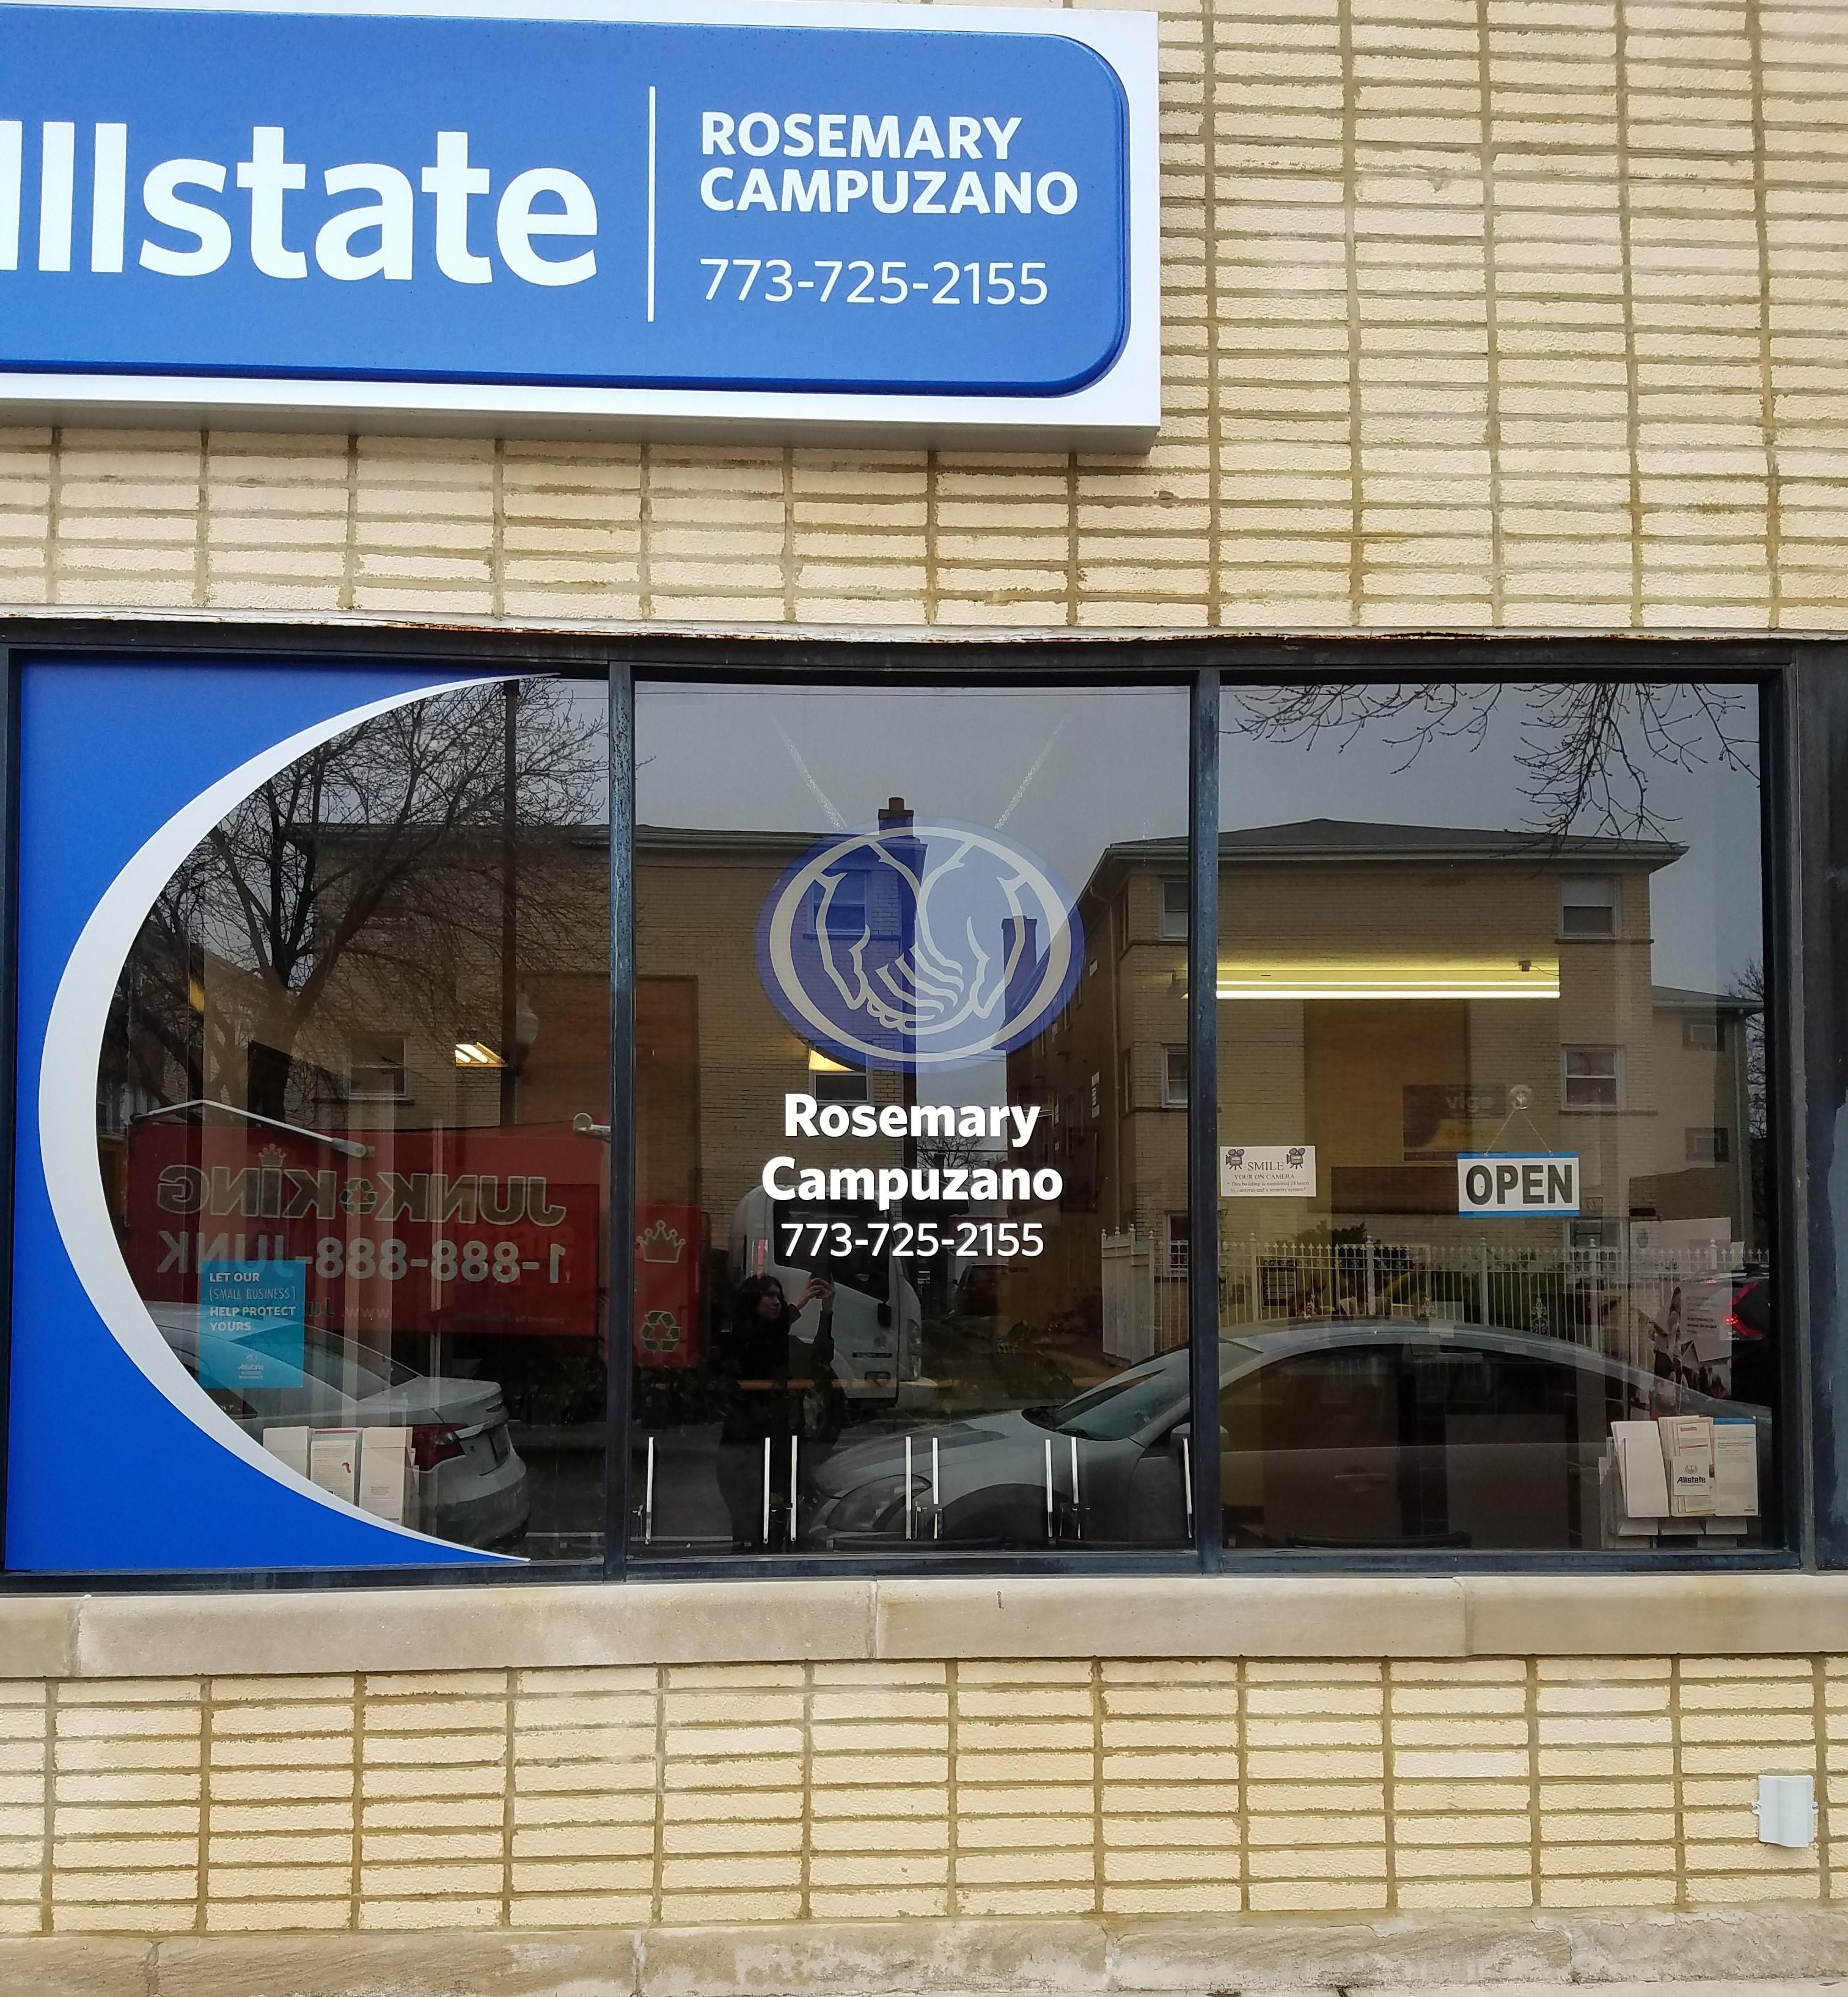 Rosemary Campuzano: Allstate Insurance image 1